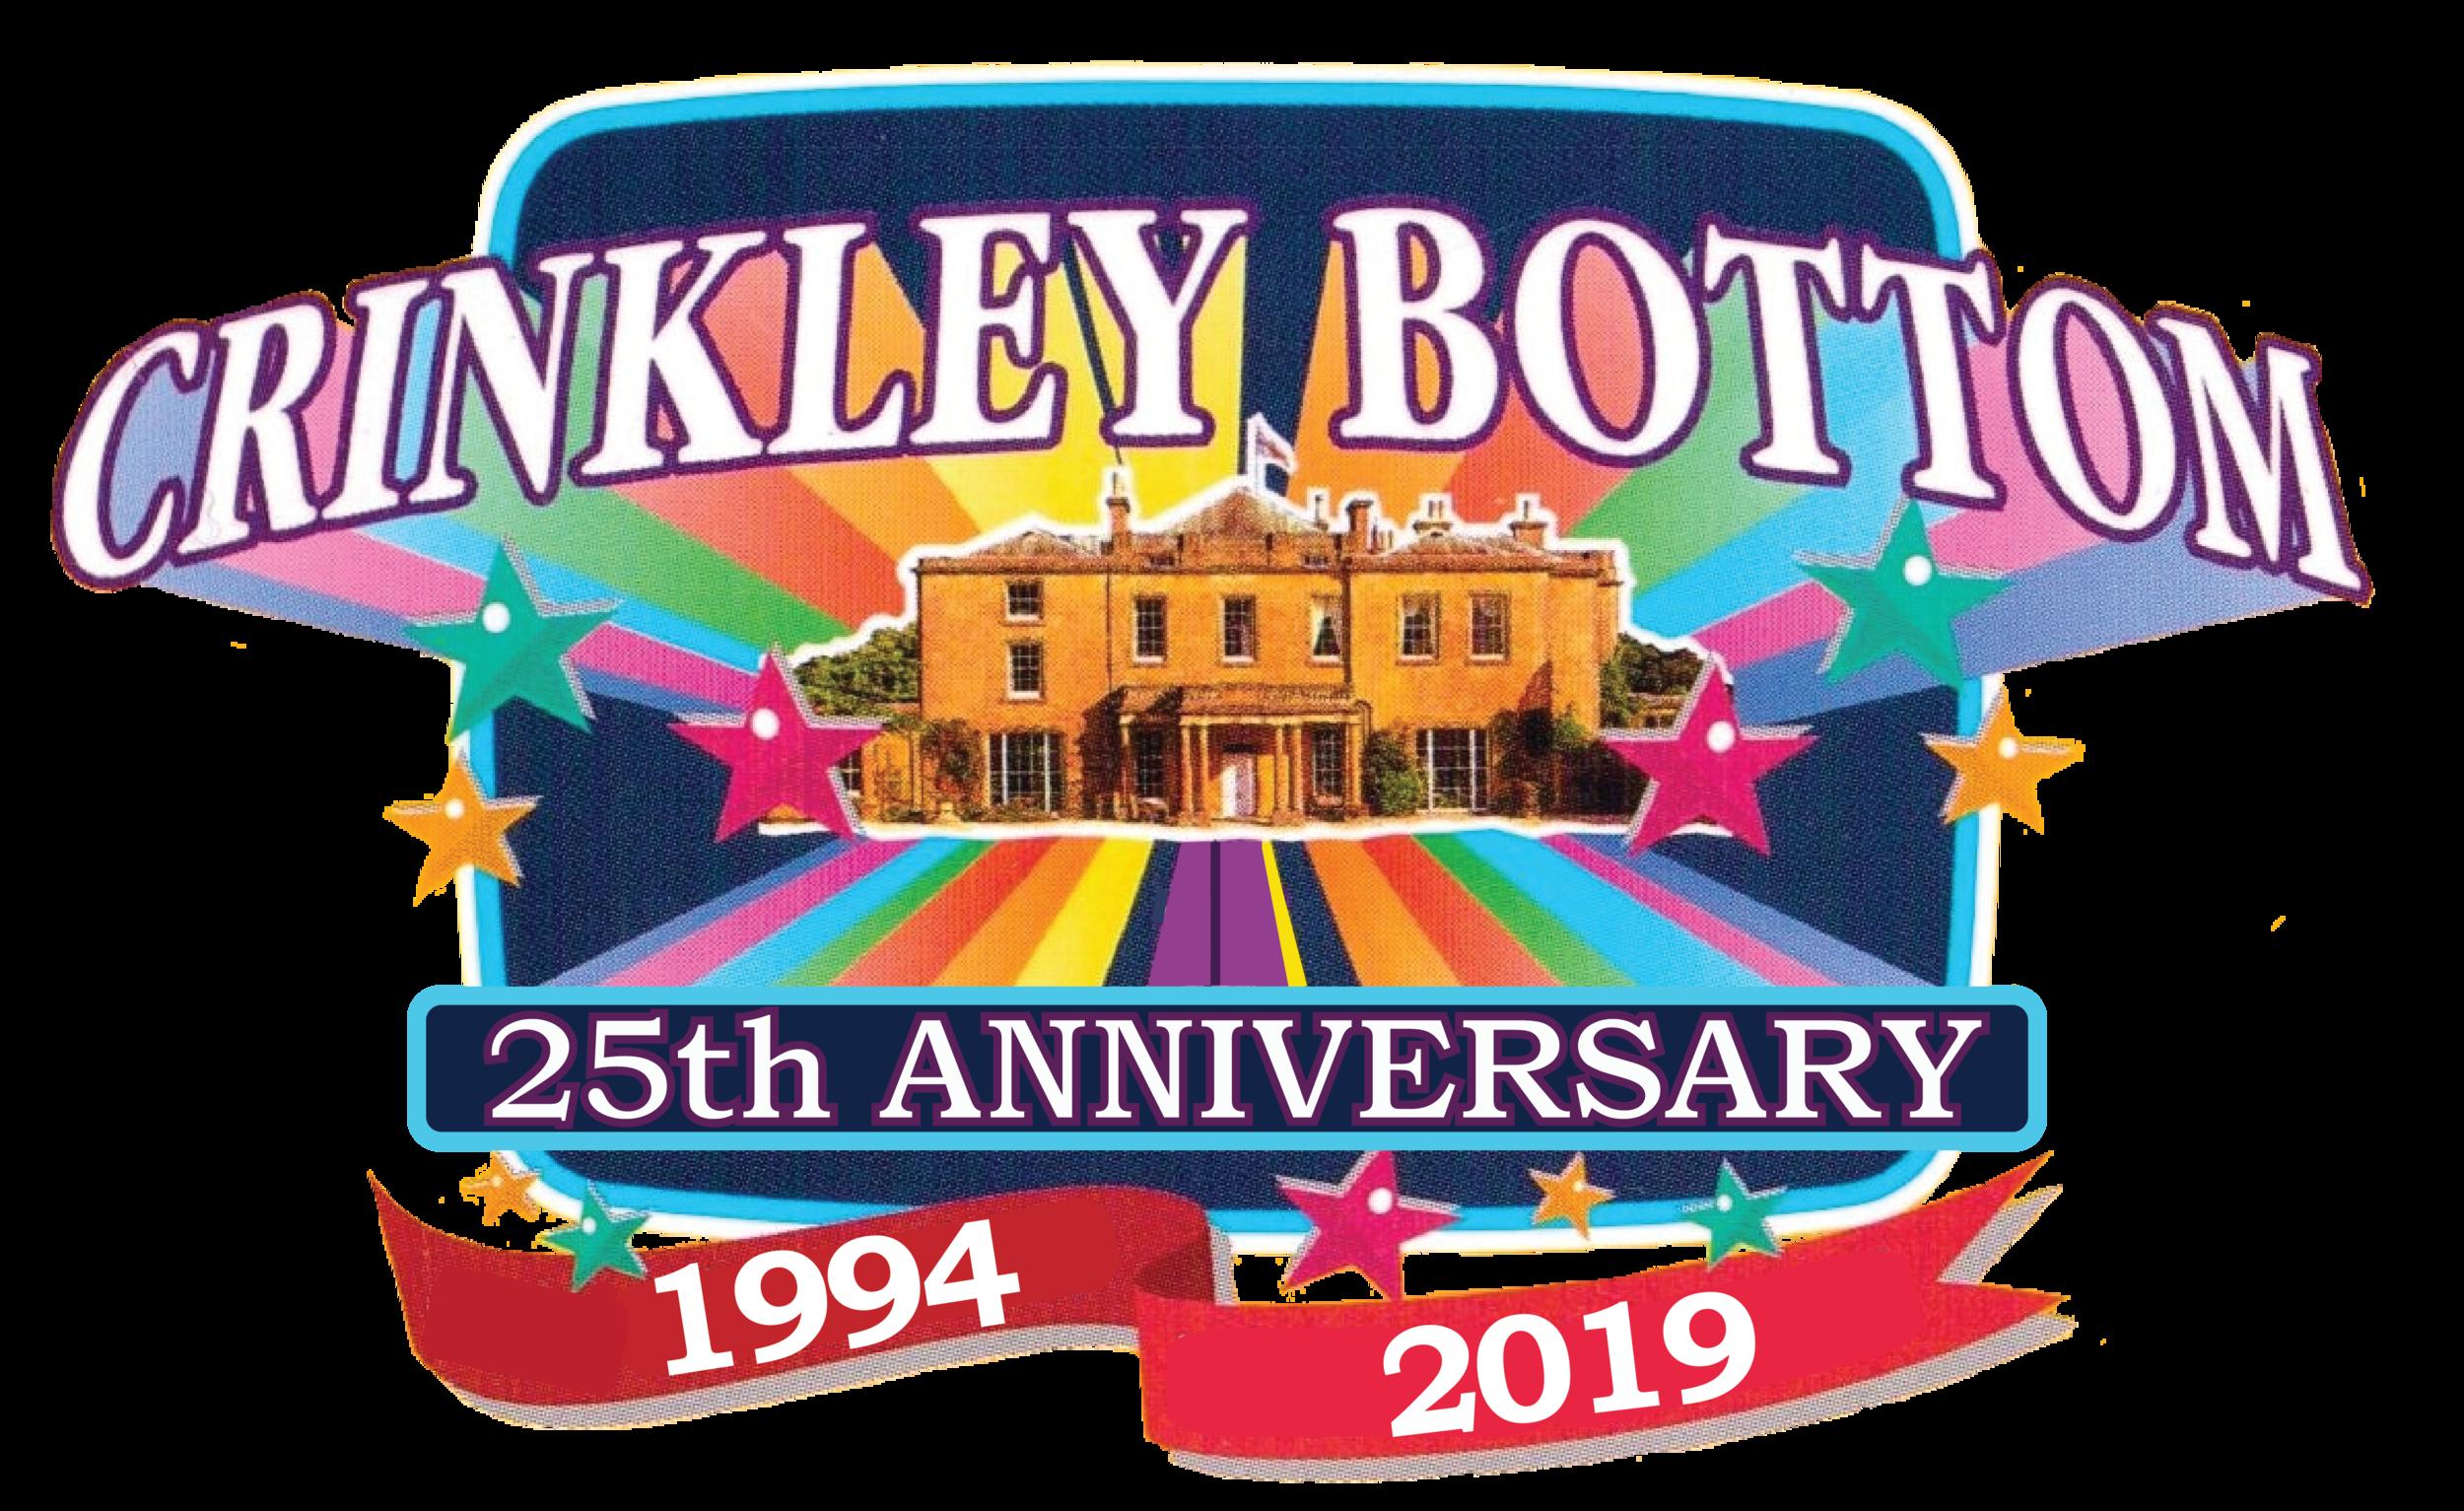 Crinkley Bottom 25th Anniversary Logo.png